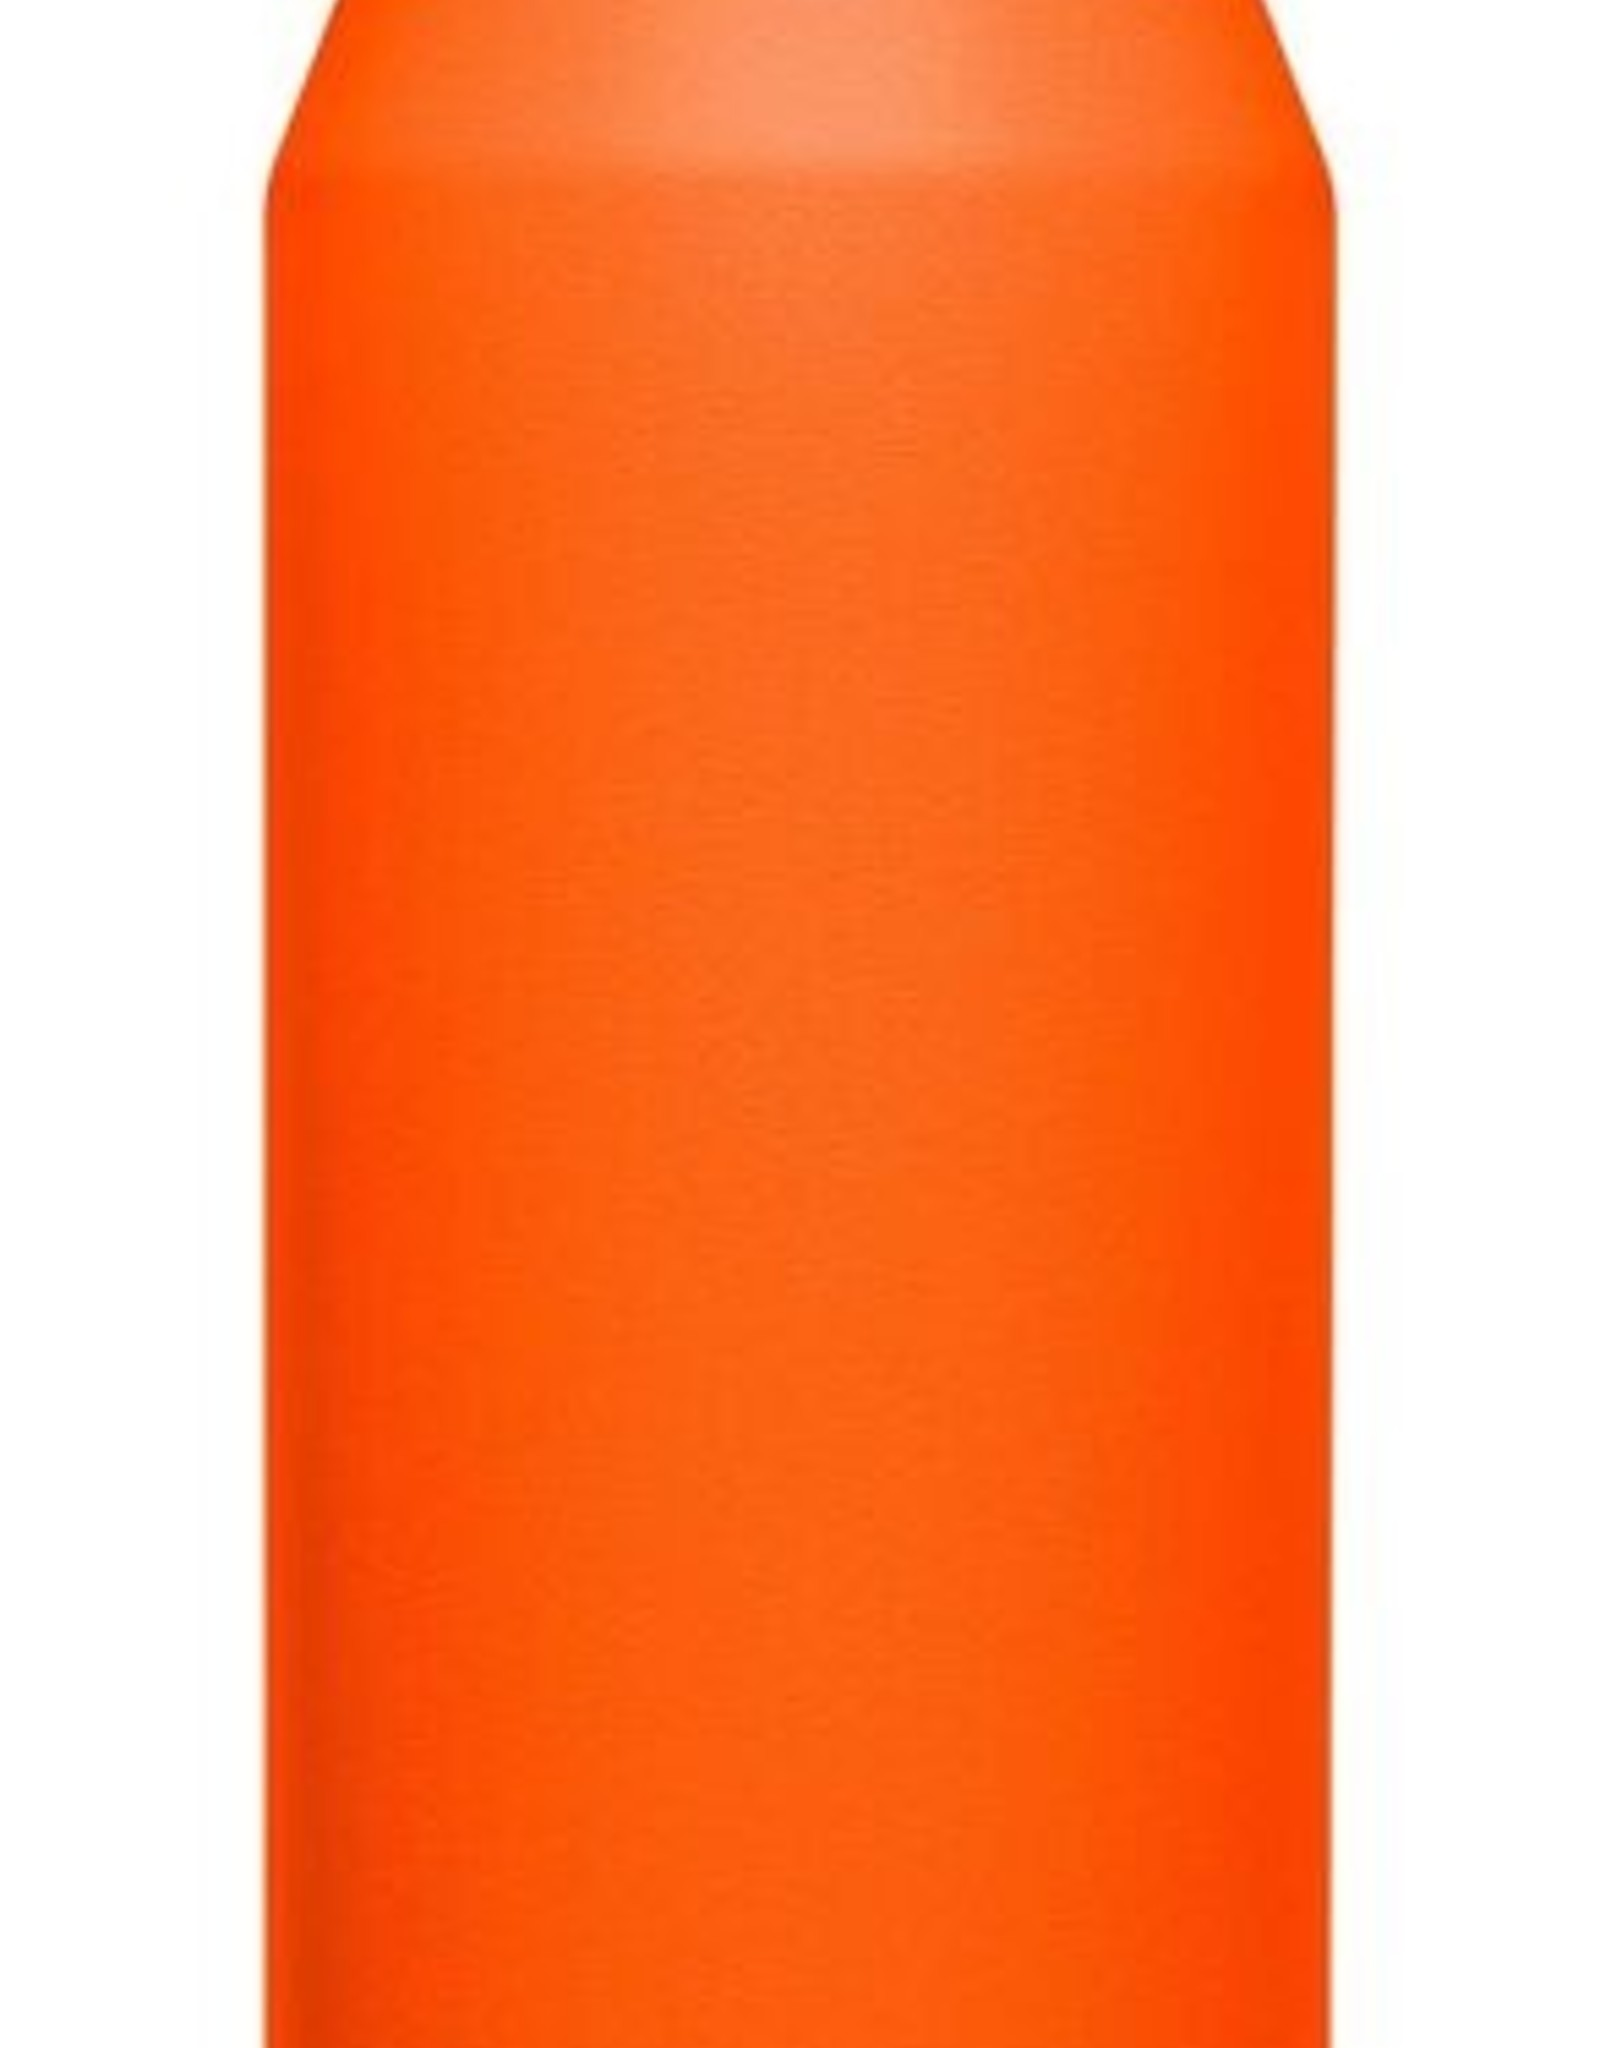 Camelbak Camelbak Chute Mag SST Vacuum Insulated 32oz